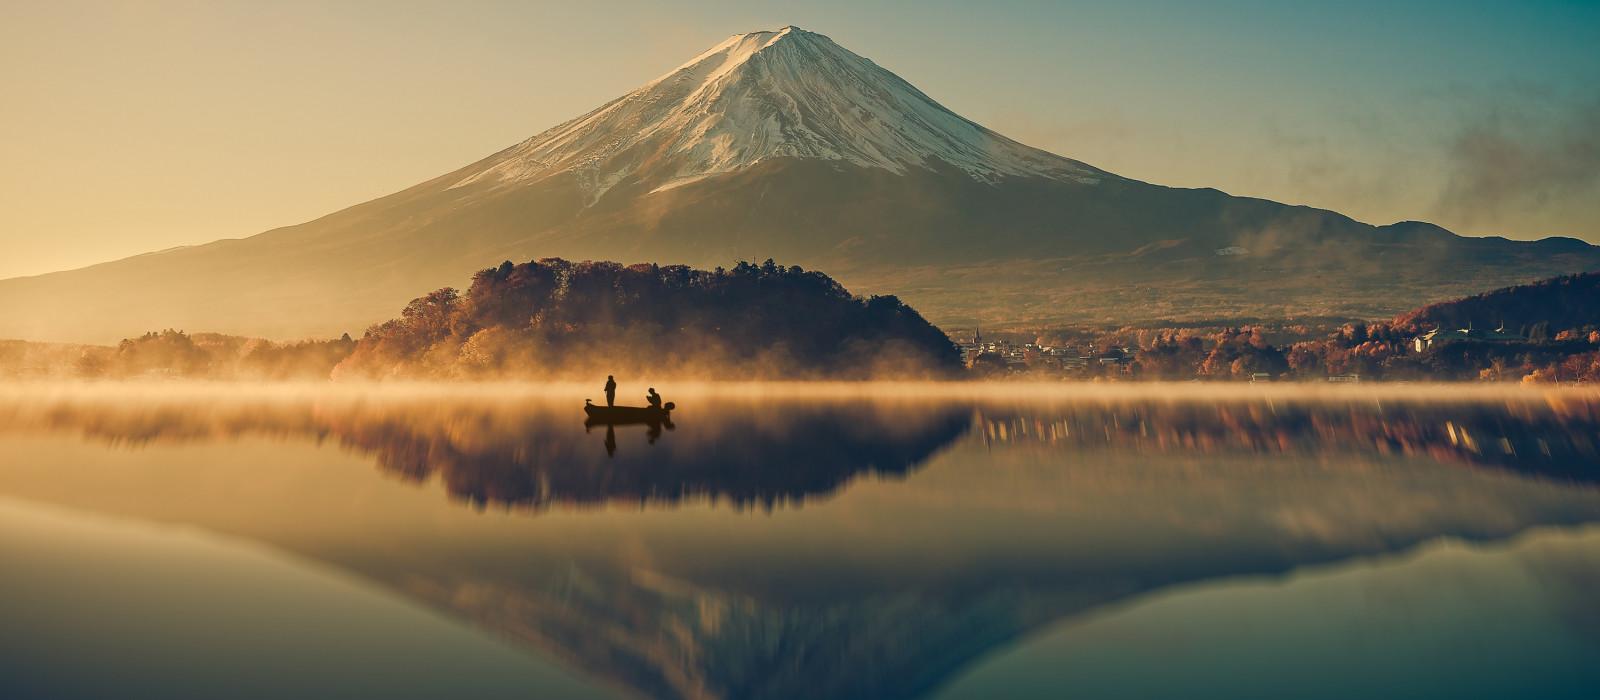 Hotel Mt Fuji Berghütte Japan